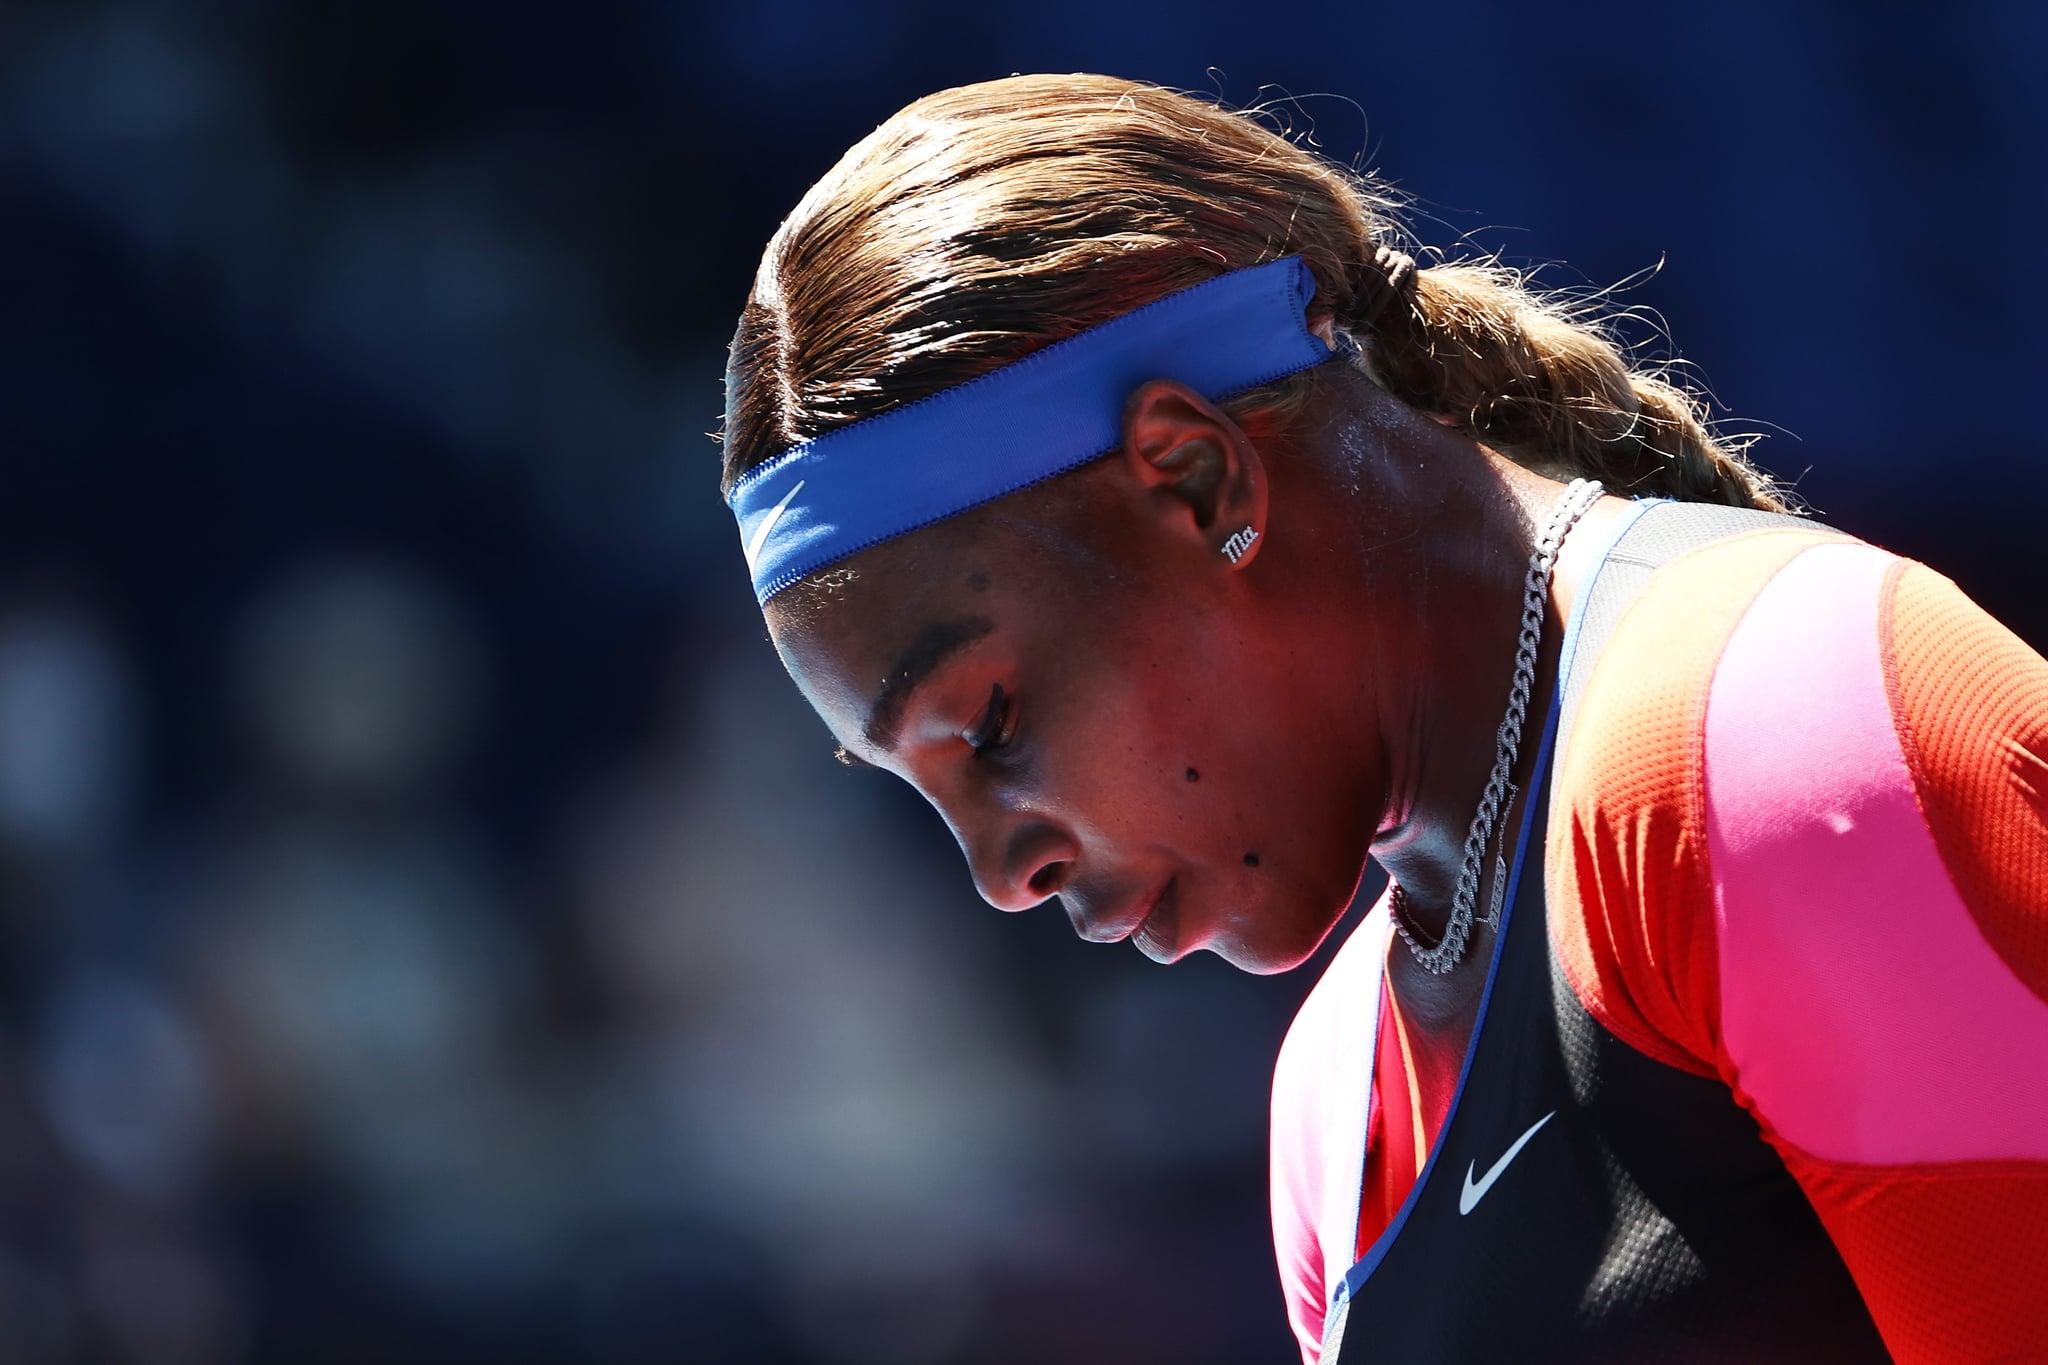 Serena Williams at 2021 Australian Open